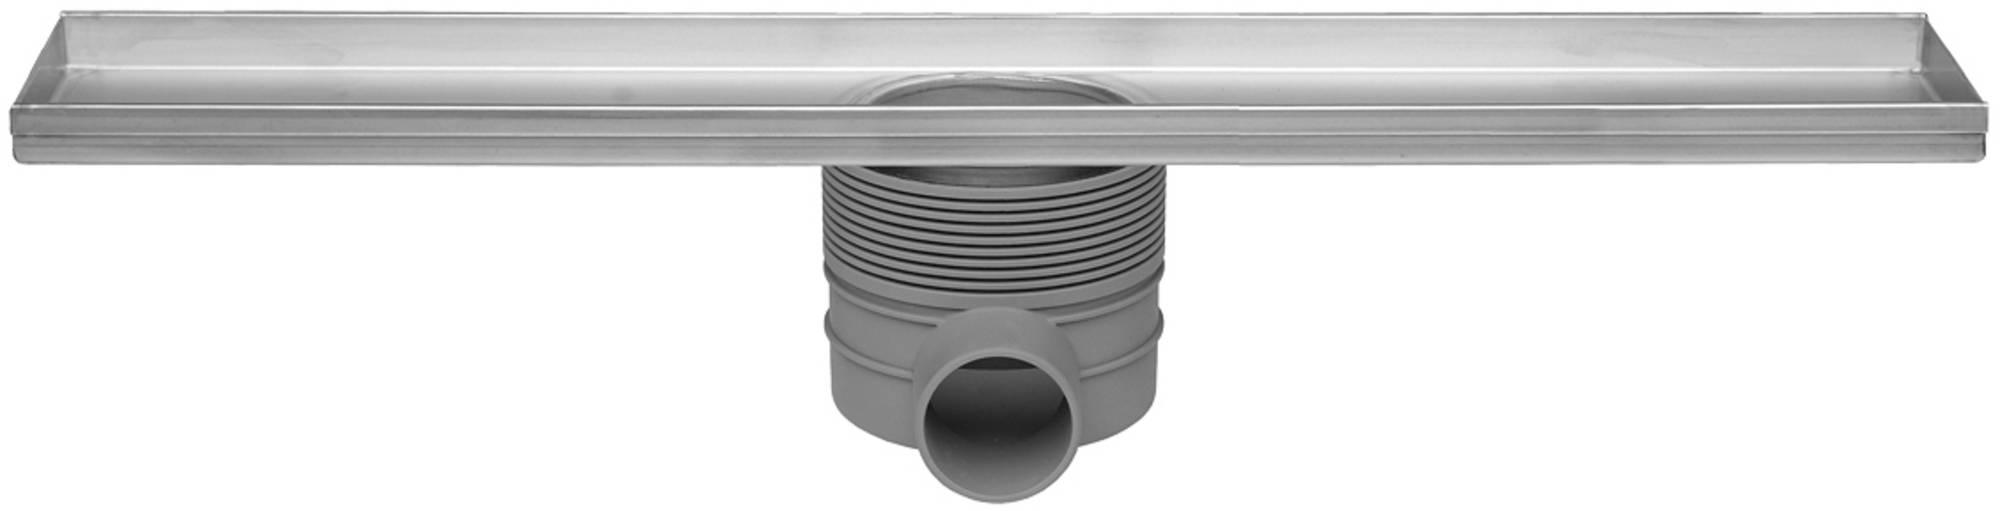 Easydrain Multi inbouwdeel drain 80 cm, zonder rooster, rvs